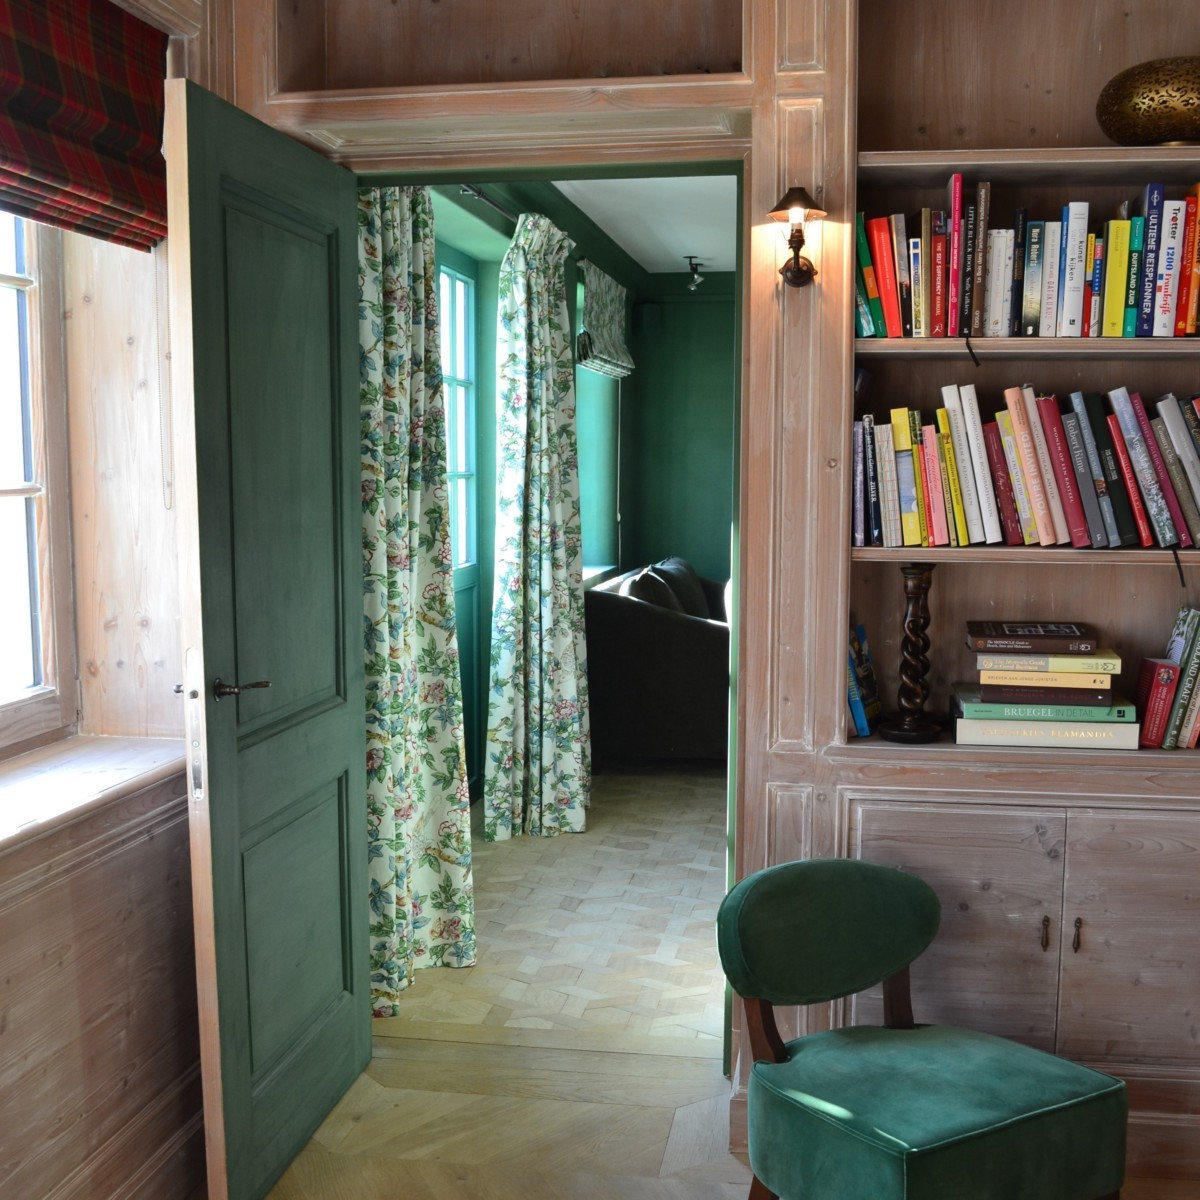 Library - Lambrisering - Panelling - Boiserie - Lefèvre Interiors Belgium